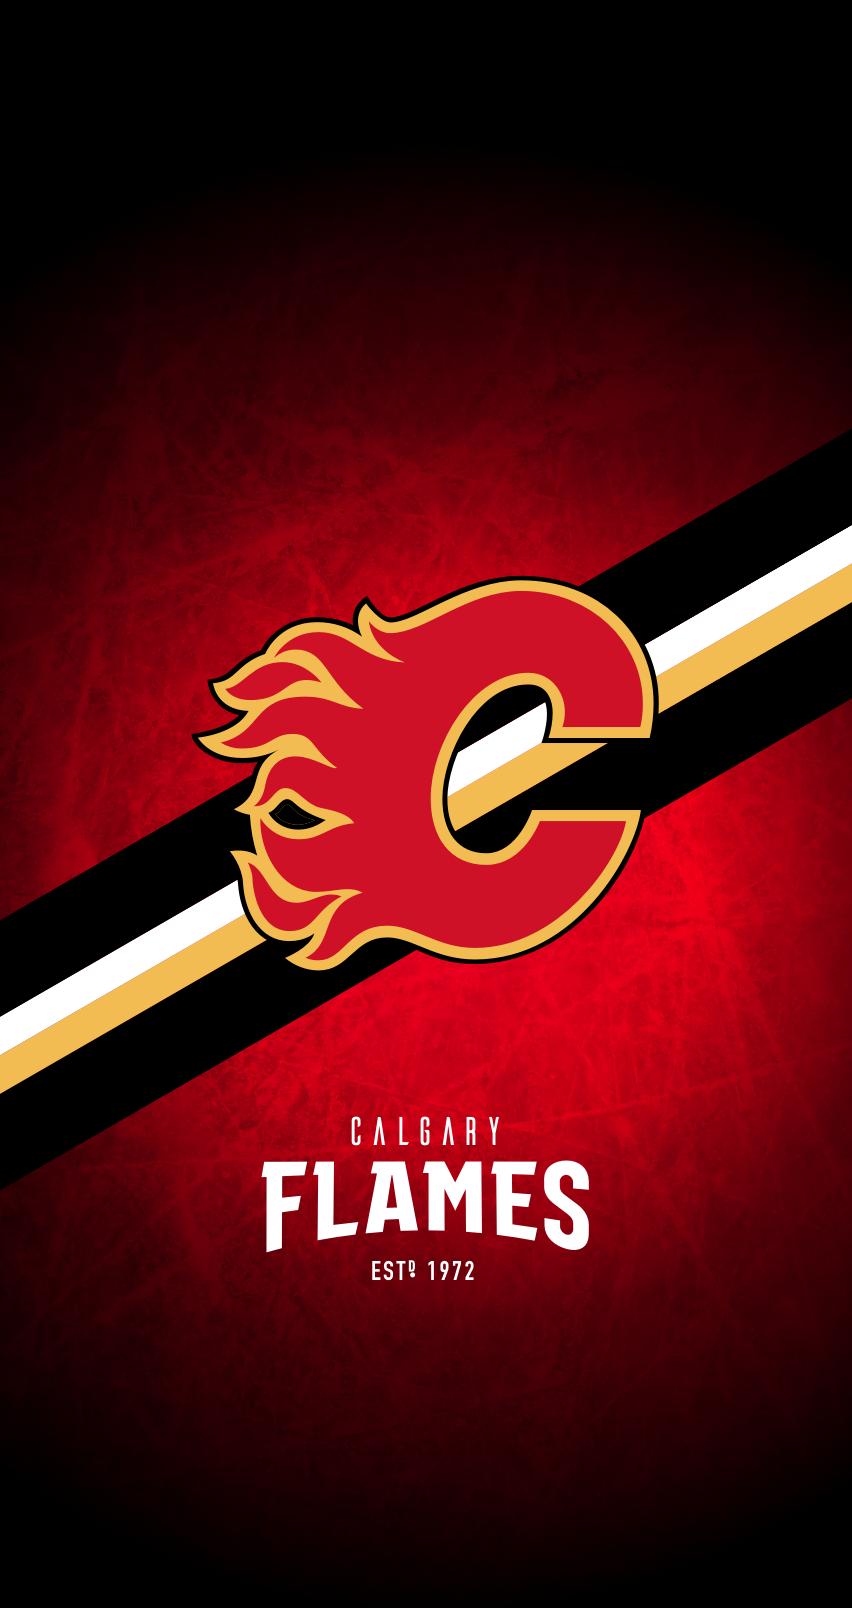 Calgary Flames Nhl Iphone 6 7 8 Lock Screen Wallpaper Nhl Wallpaper Calgary Flames Calgary Flames Hockey